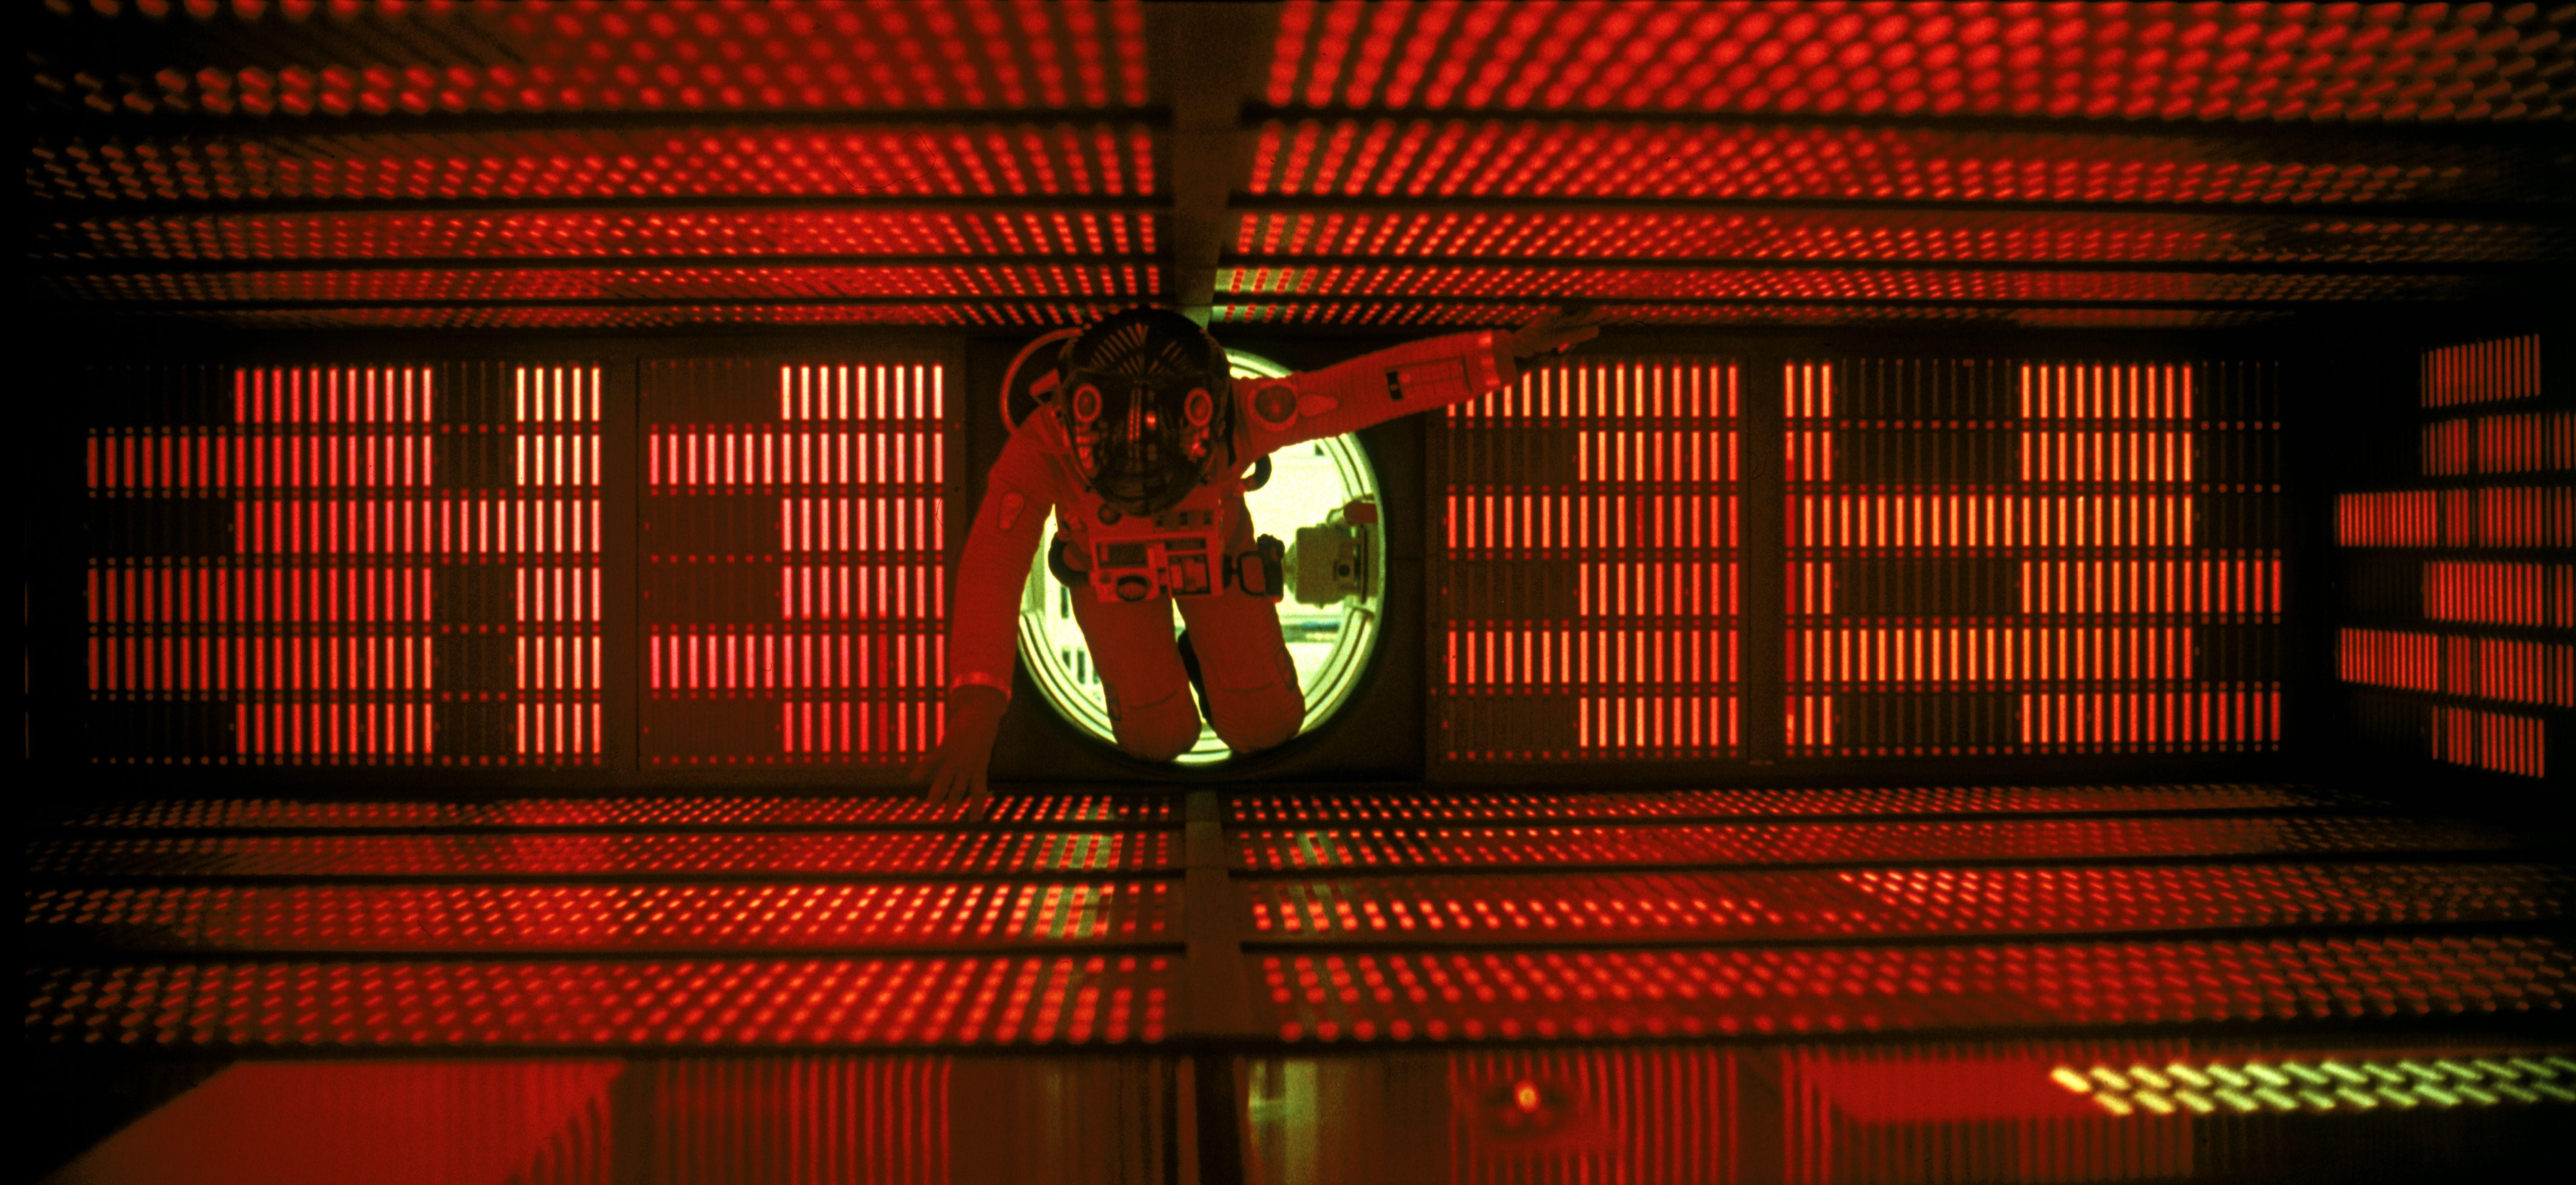 2001 A Space Odyssey Google Search 2001 A Space Odyssey Space Odyssey Stanley Kubrick